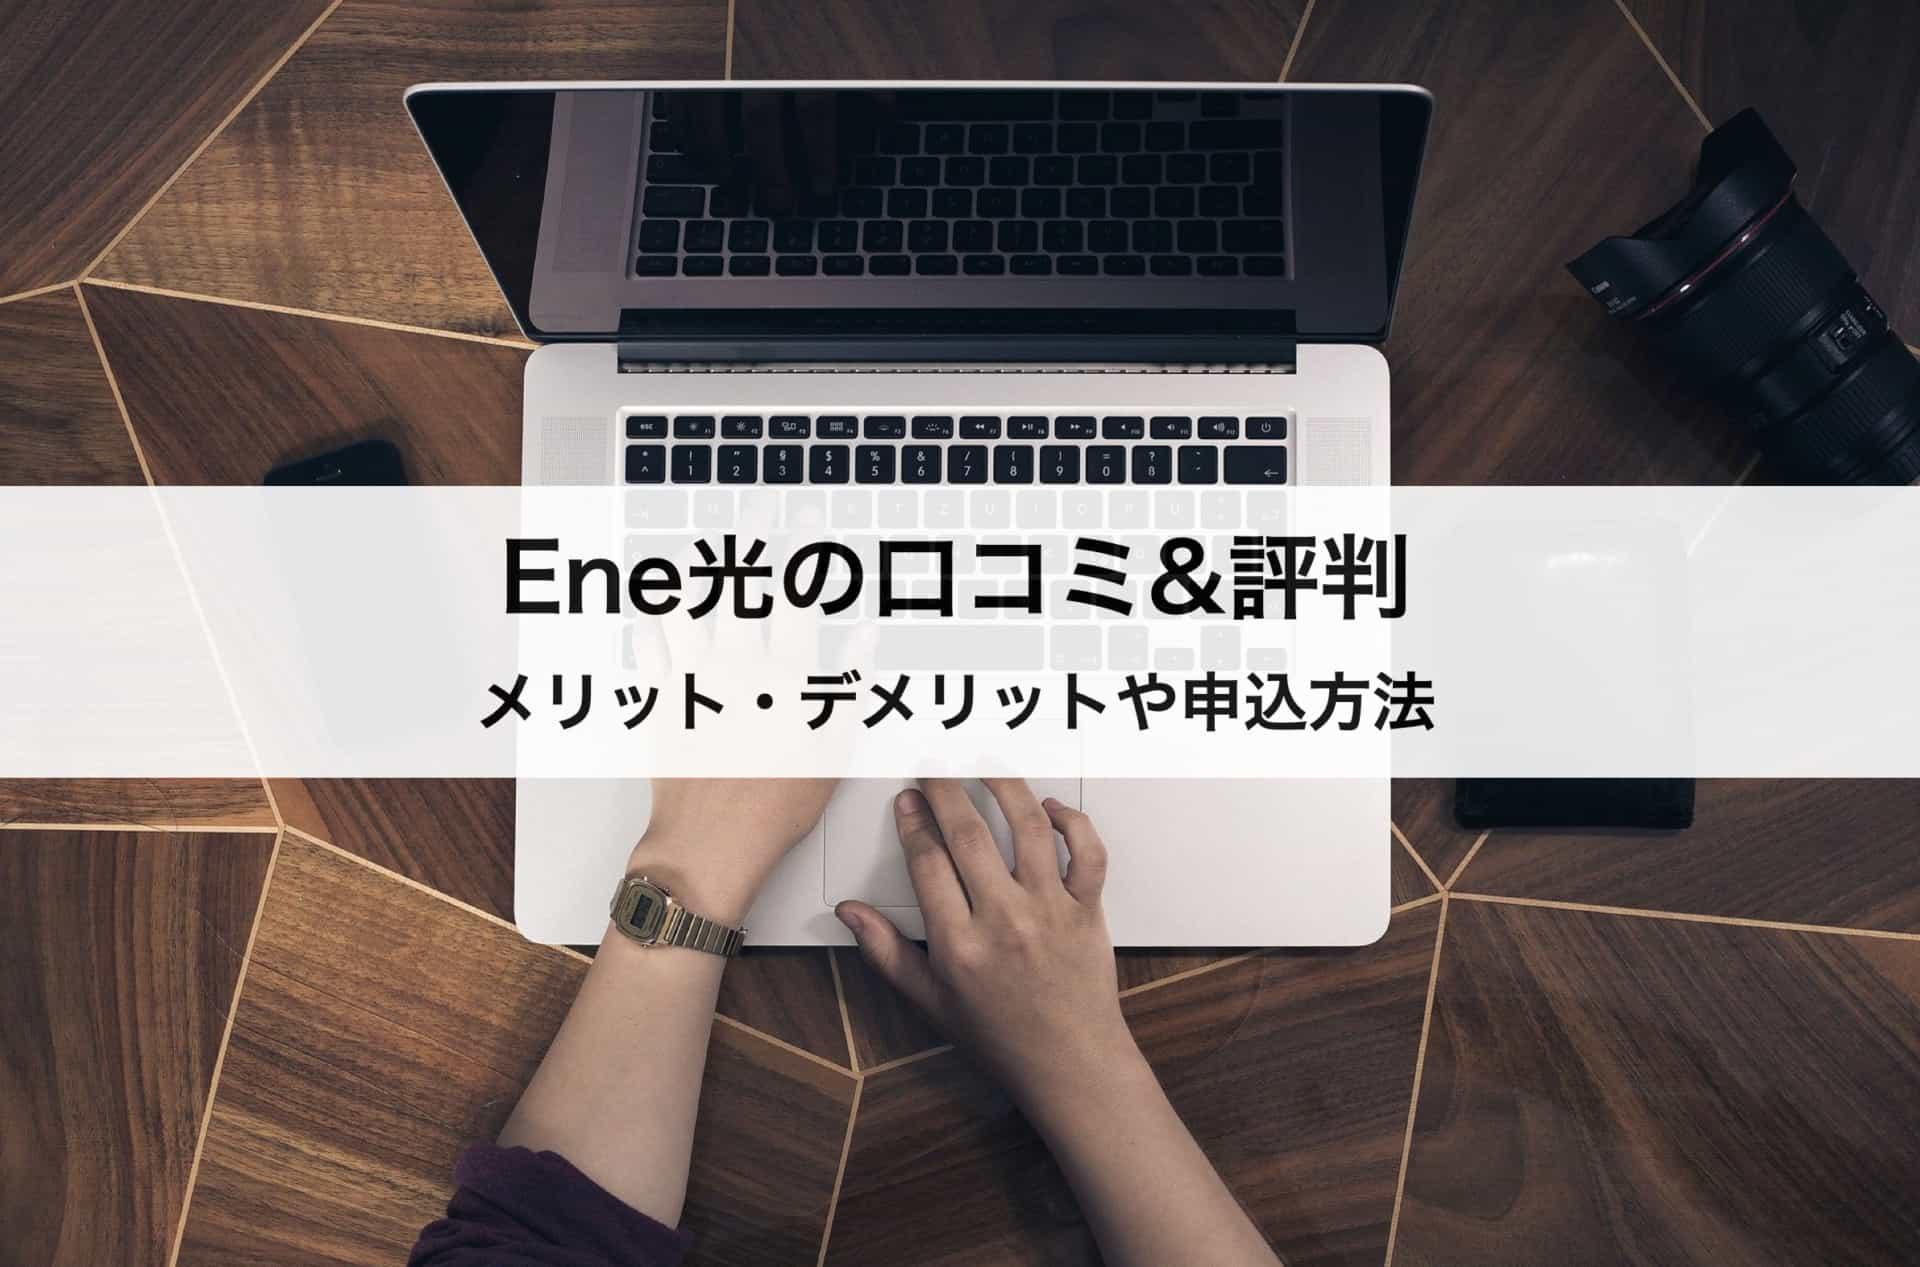 Ene光の口コミ&評判|メリット・デメリットや申込方法まで徹底解説!